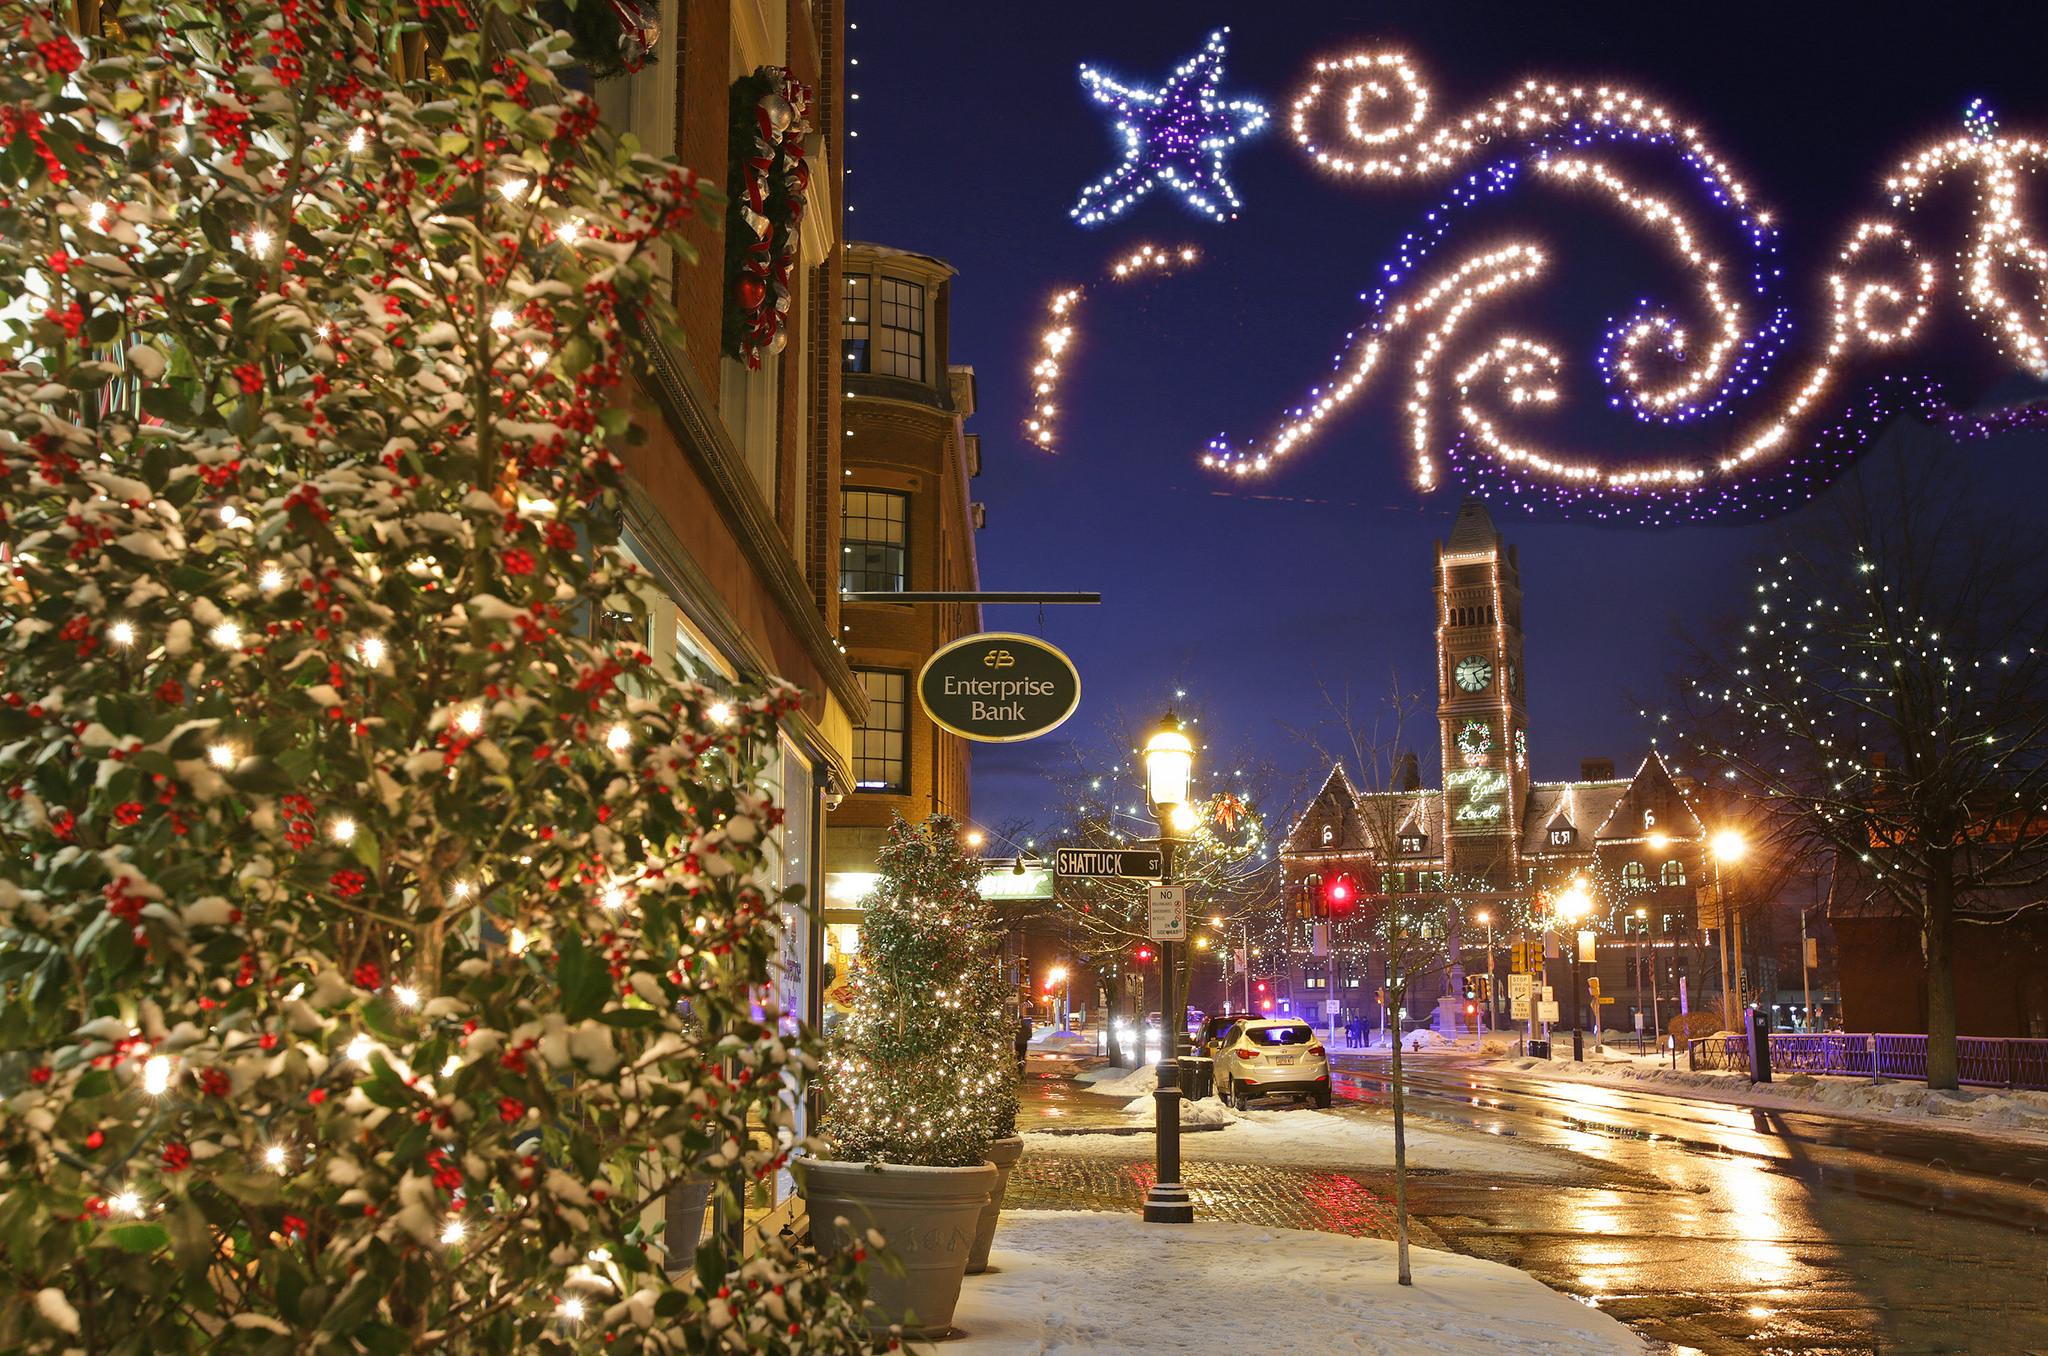 8 Best Christmas Main Streets Near Boston 2017